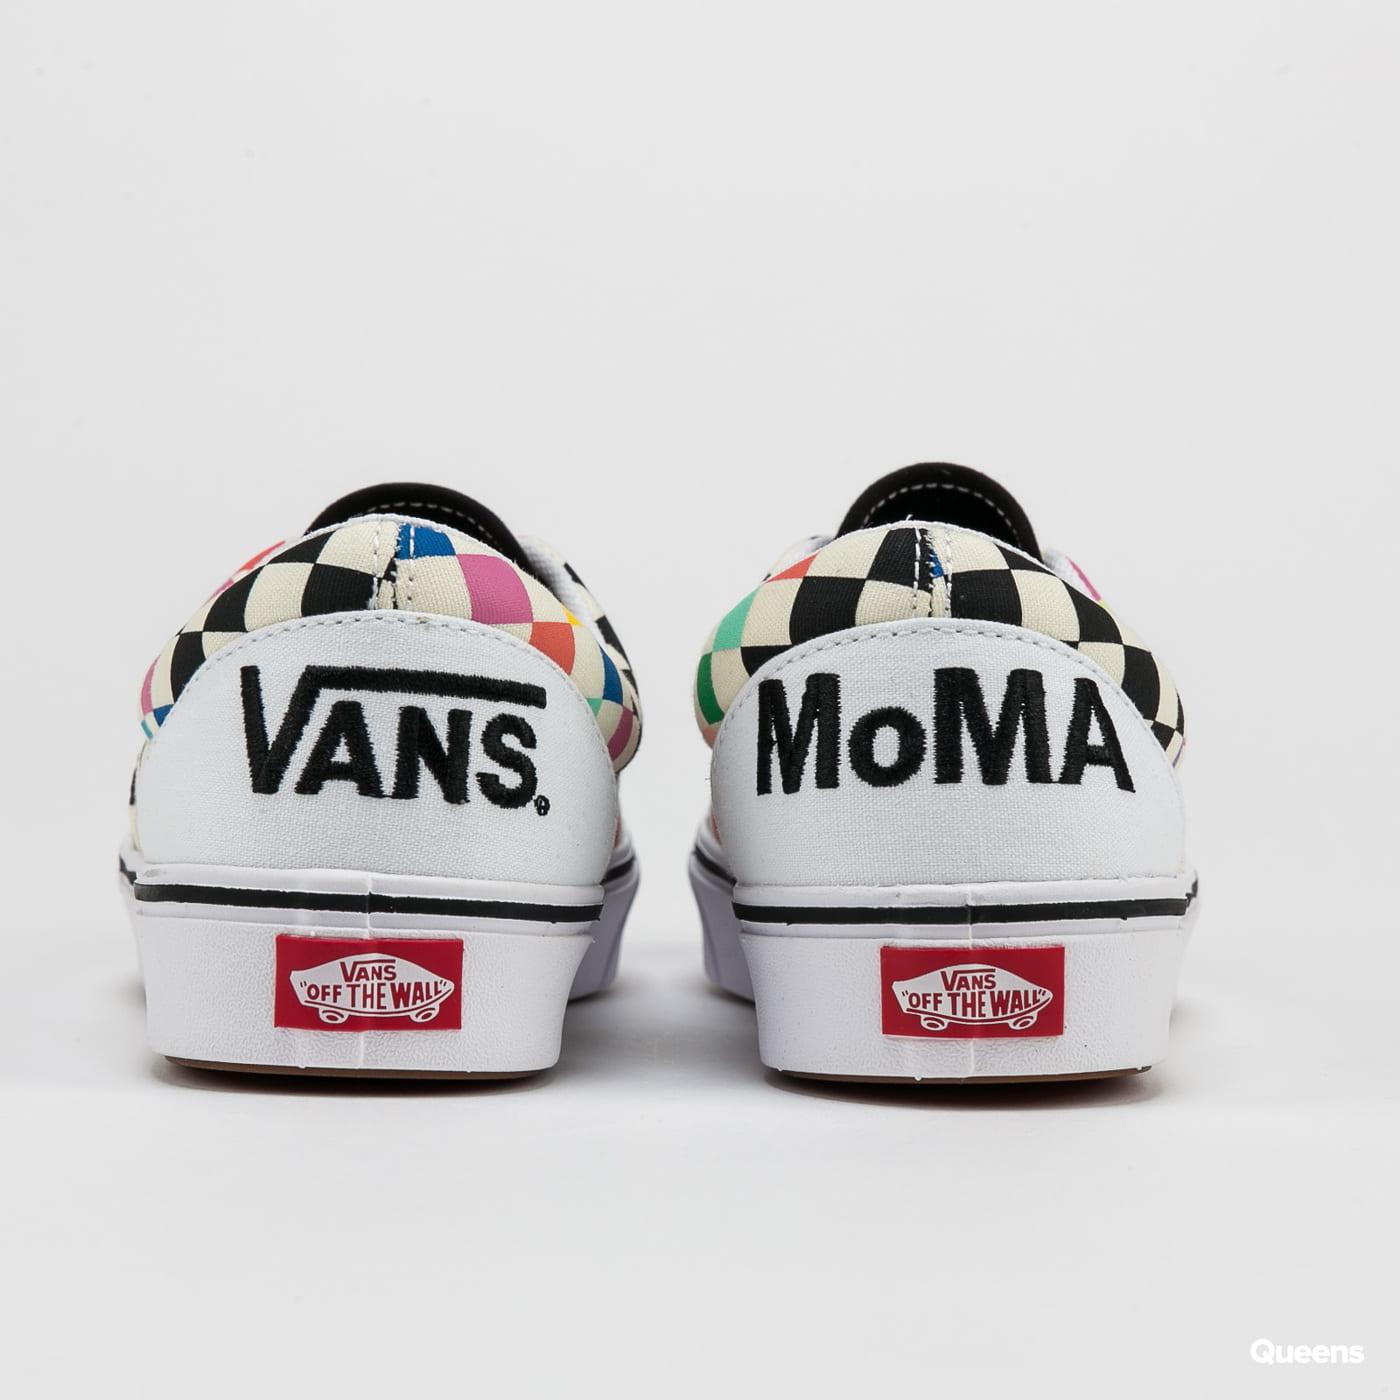 Vans Vans X MoMa Comfycush Era (moma) brand